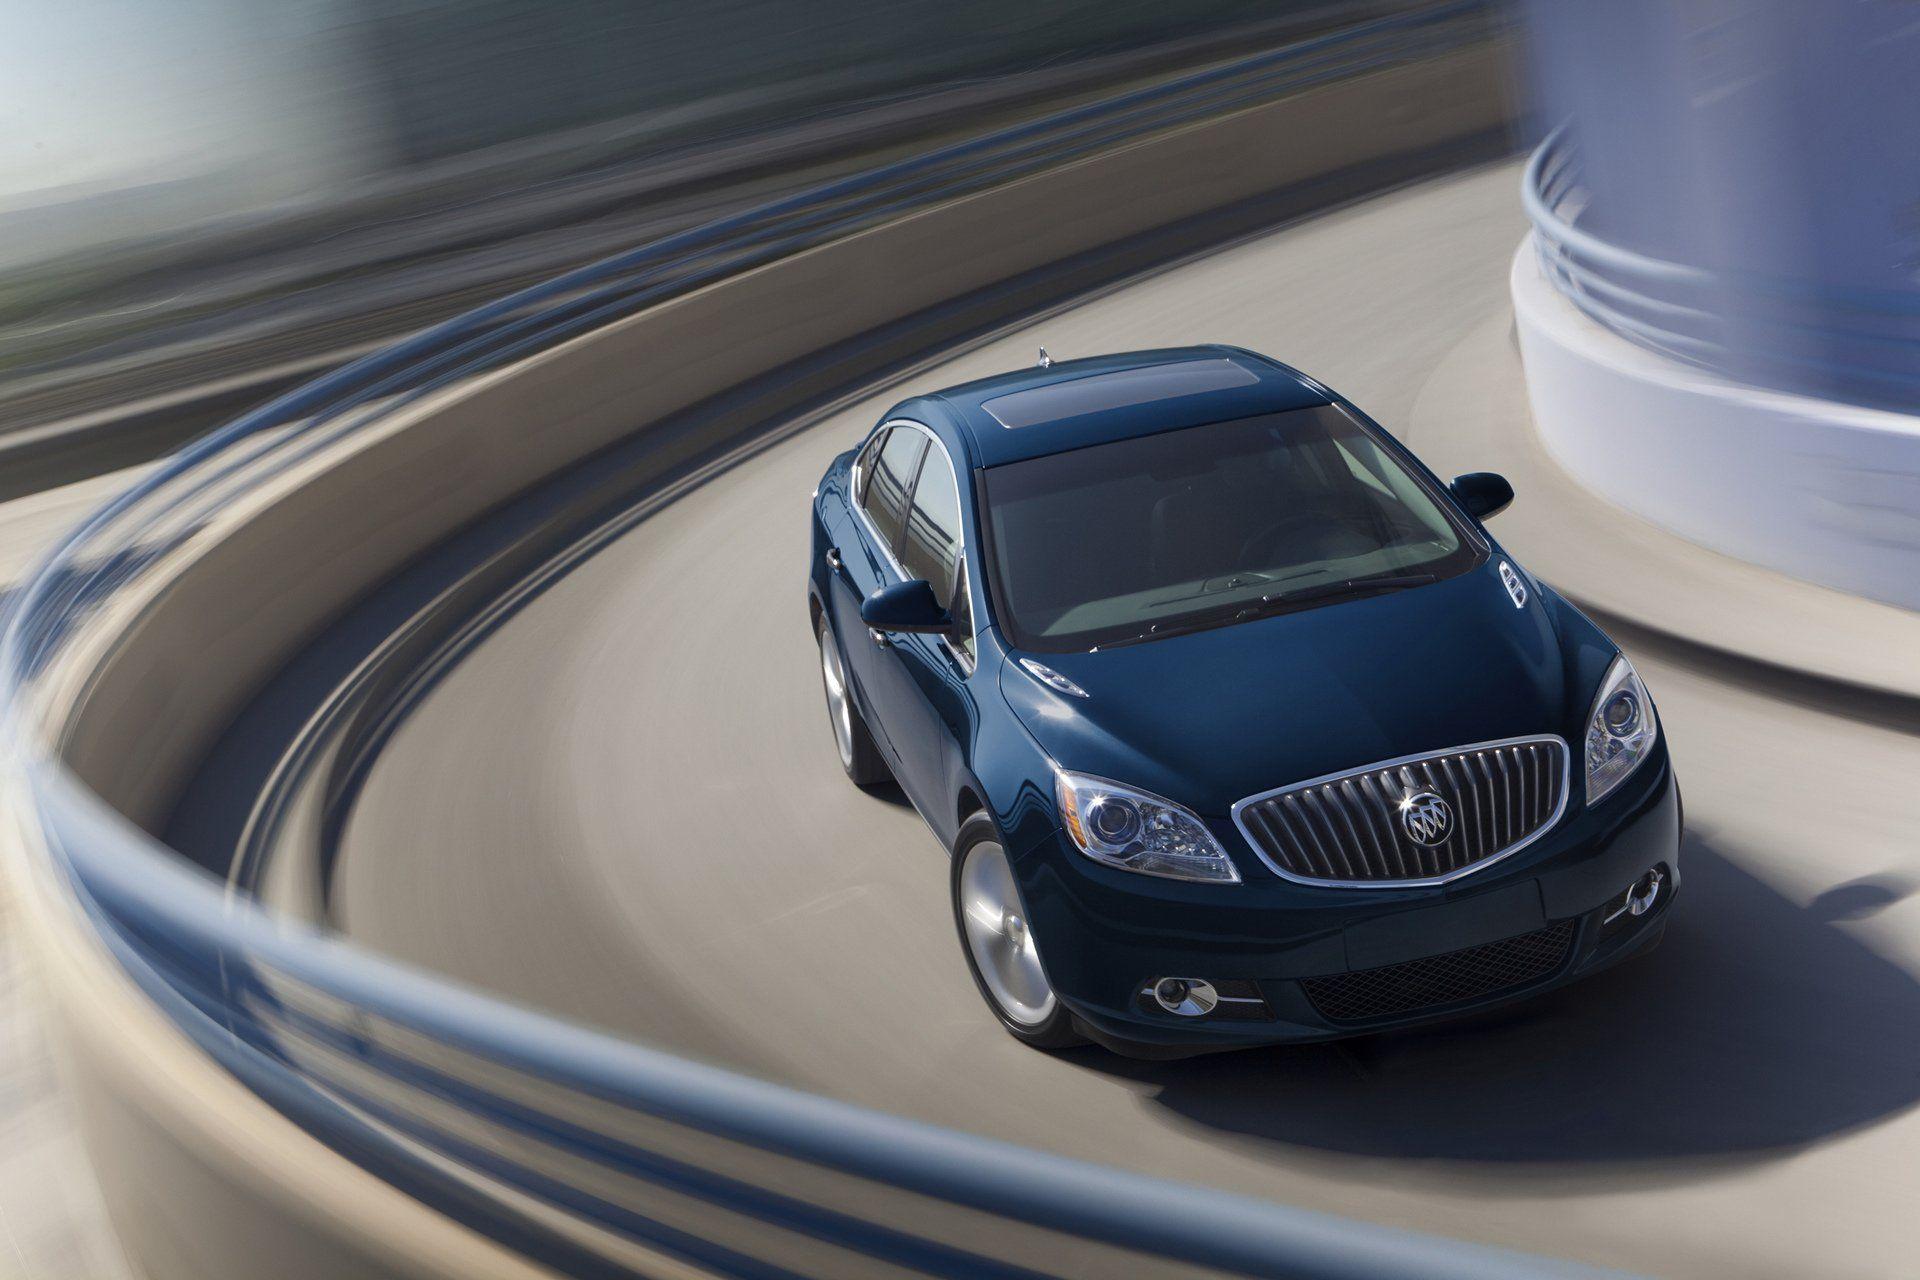 2016 Buick Verano Review Carrrs Auto Portal Buick Verano Buick Best New Cars